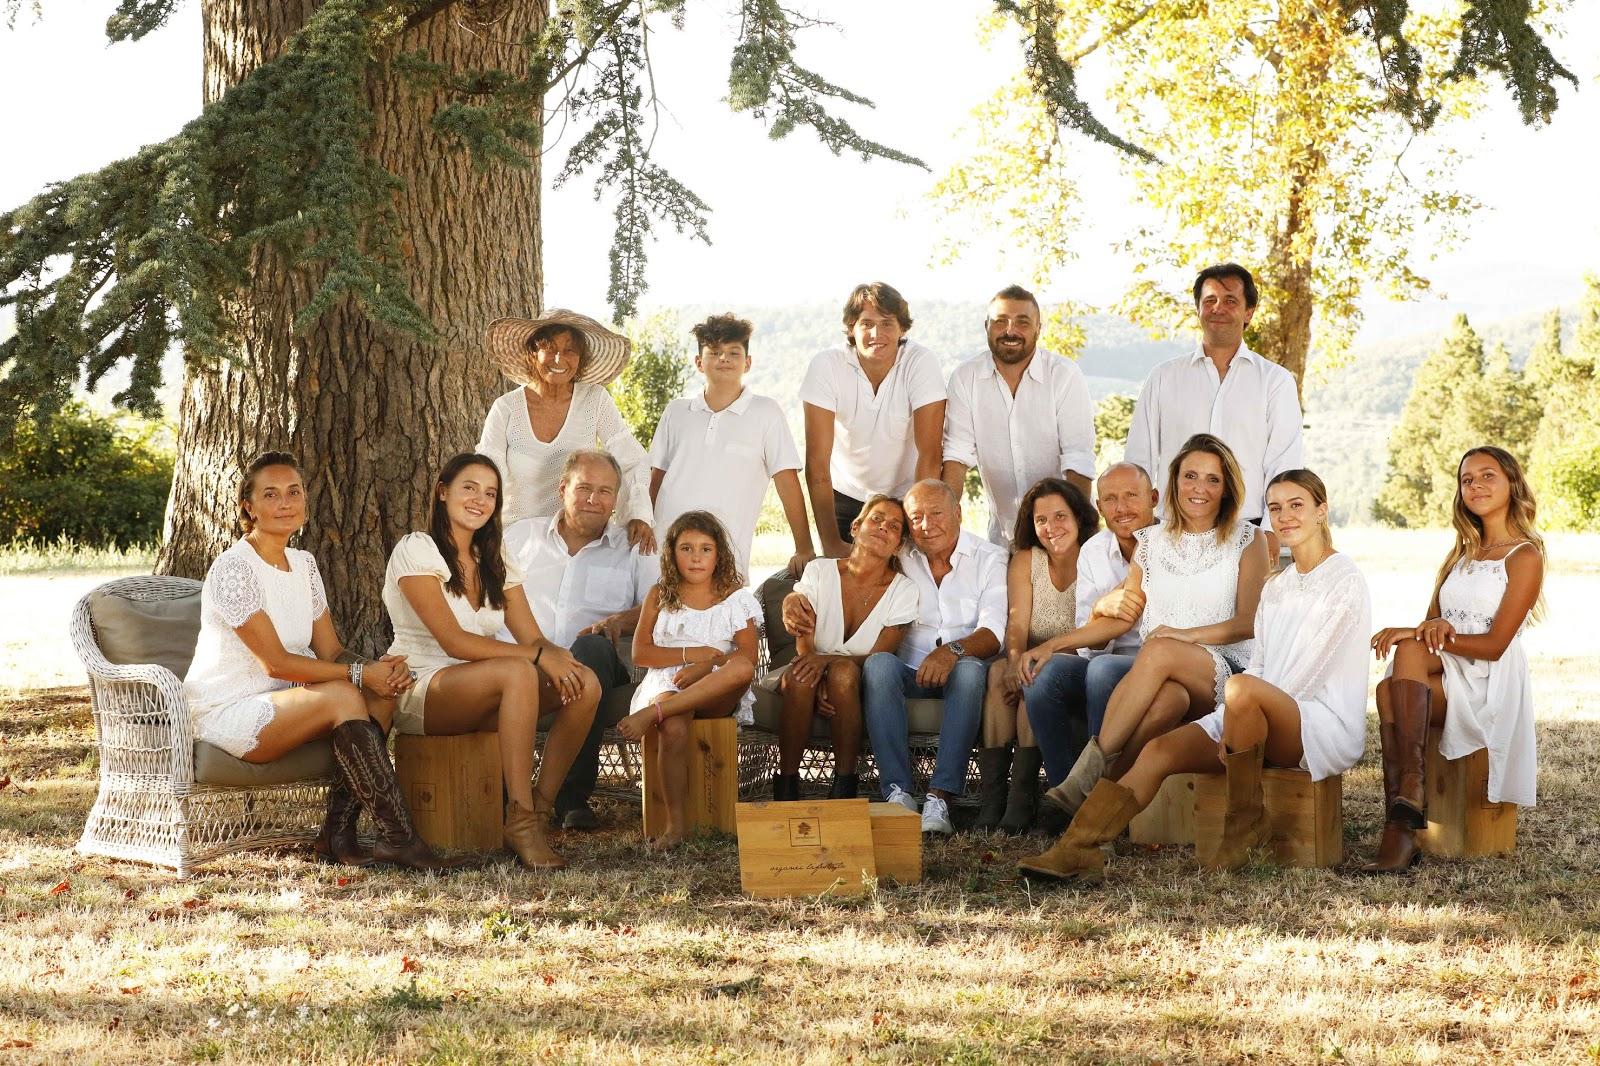 Fattoria Lavacchio's work team